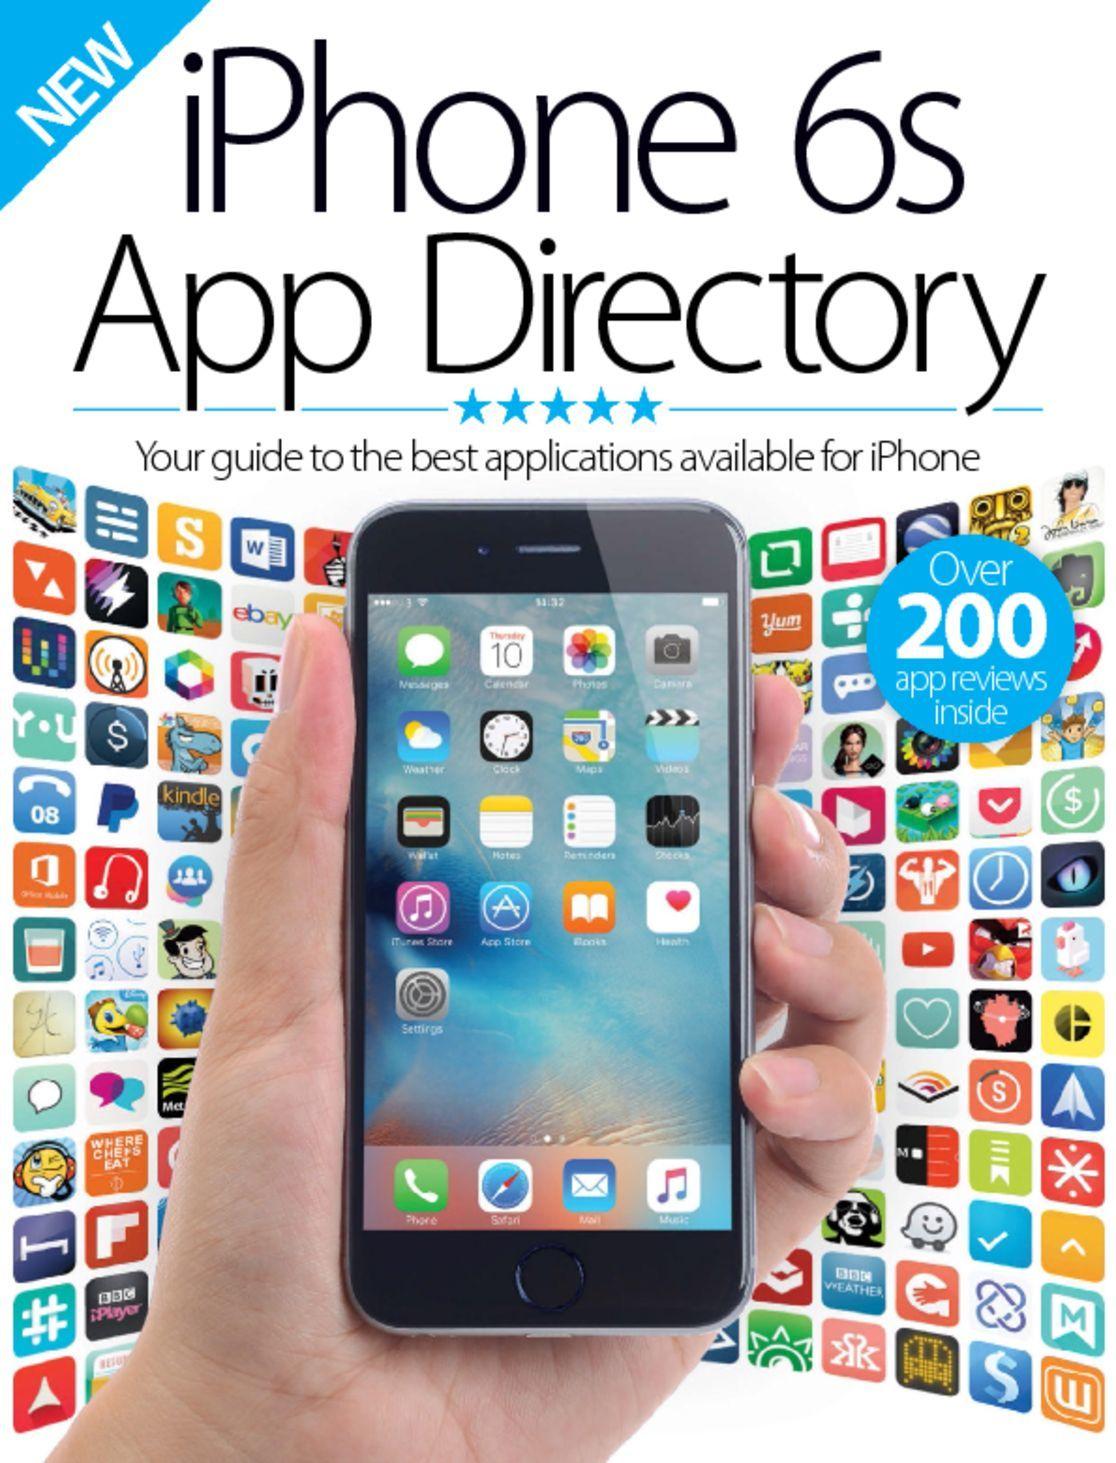 iPhone 6S App Directory Vol 1 Magazine Subscription (Digital)